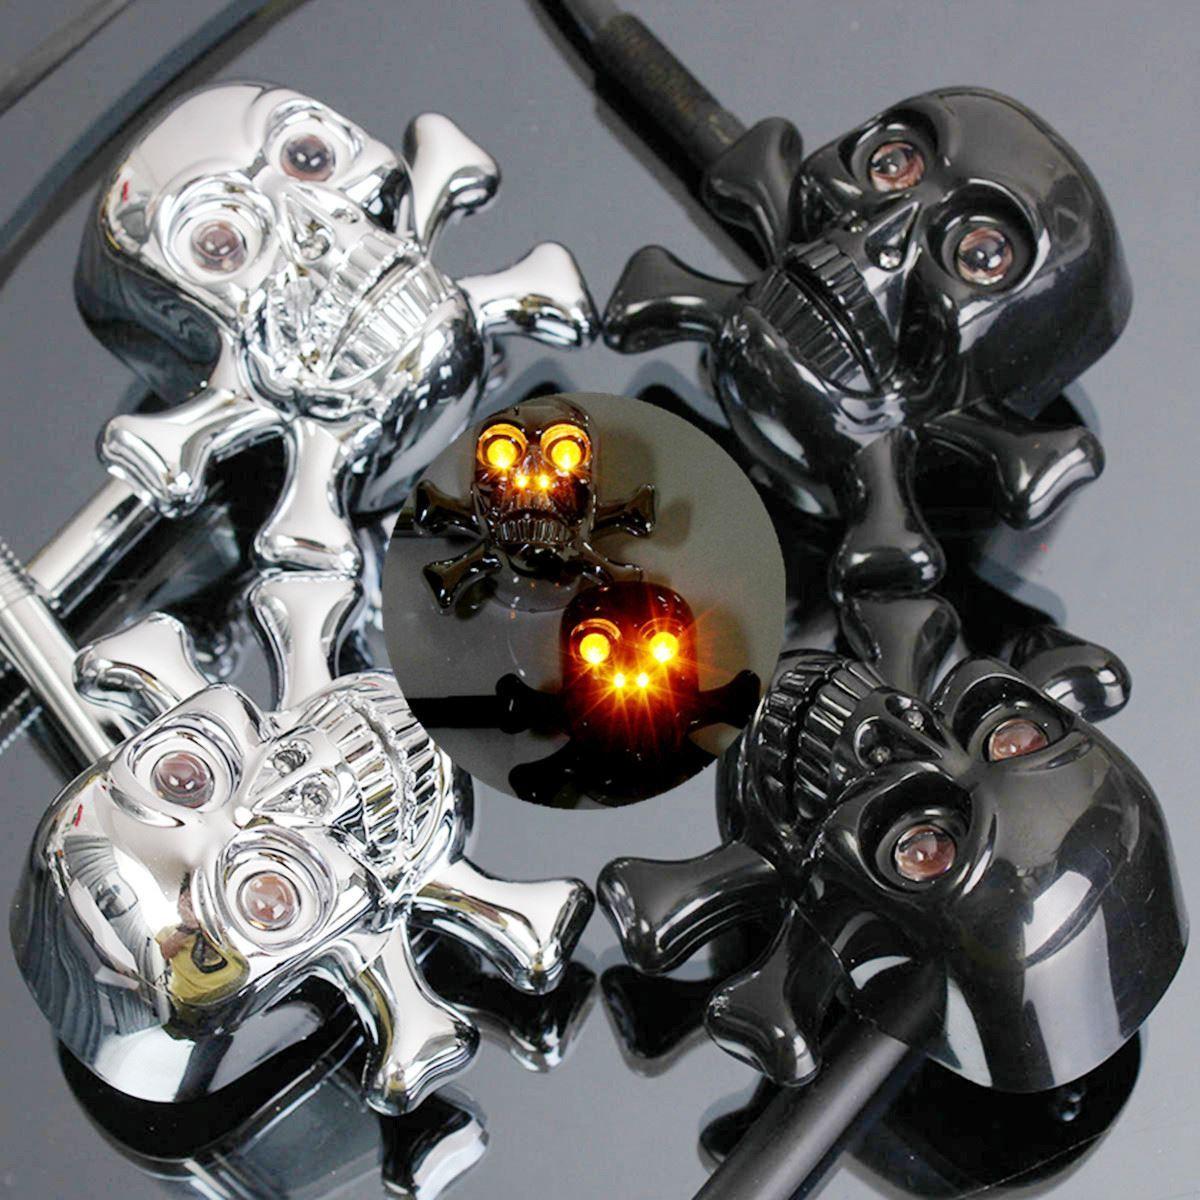 2PCS Universal 12V Black Chrome Motorcycle Skull Turn Signal Indicator Light Amber